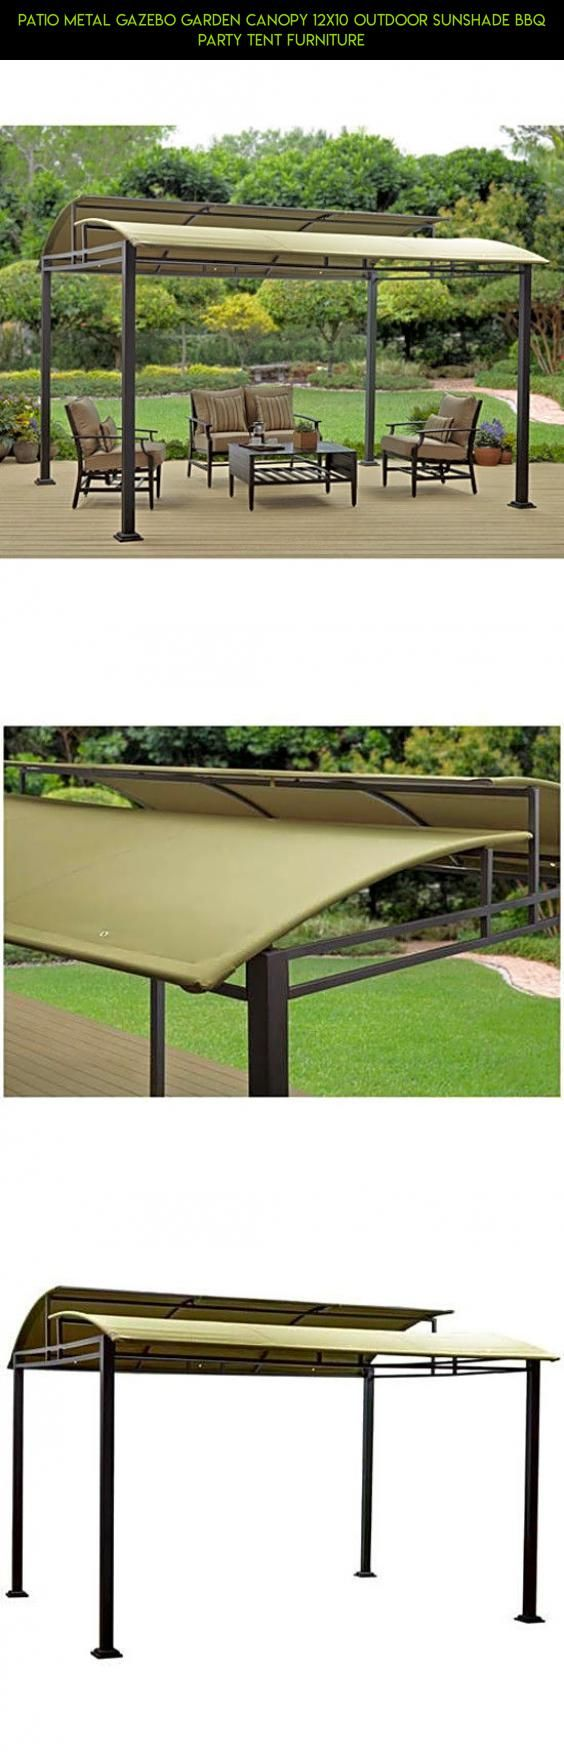 Patio Metal Gazebo Garden Canopy 12x10 Outdoor Sunshade Bbq Party Tent Furniture #technology #furniture #patio #gazebo #racing #tech #fpv #parts #kit #products #camera #shopping #drone #plans #gadgets